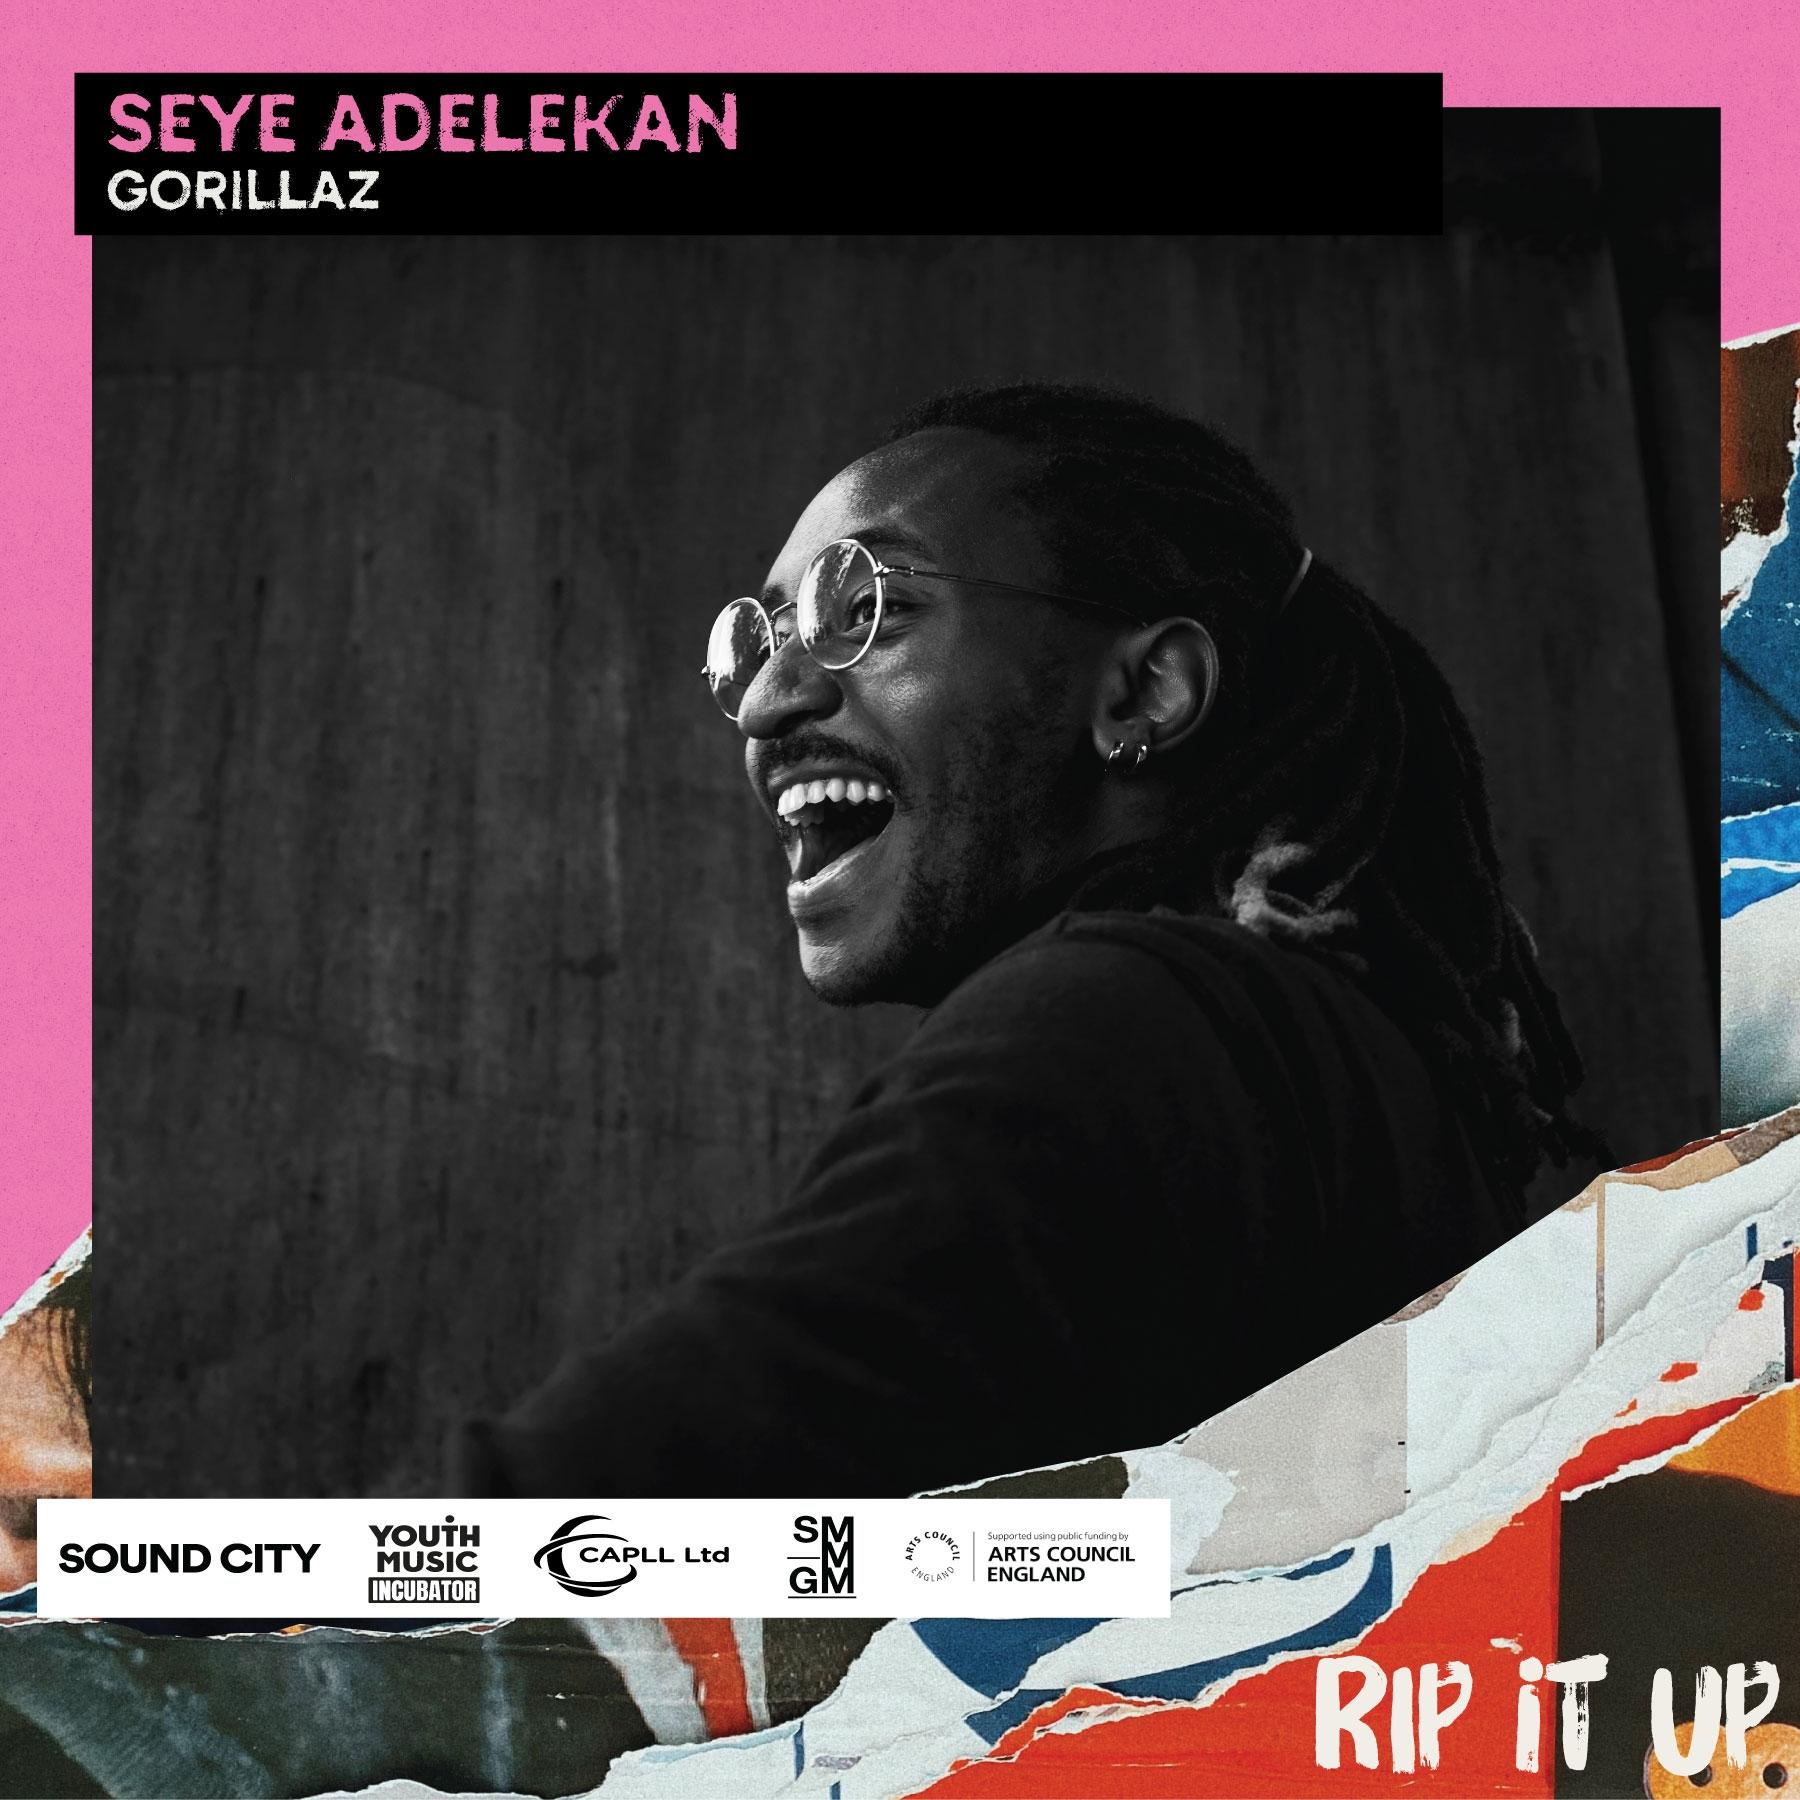 Meet Seye Adelekan